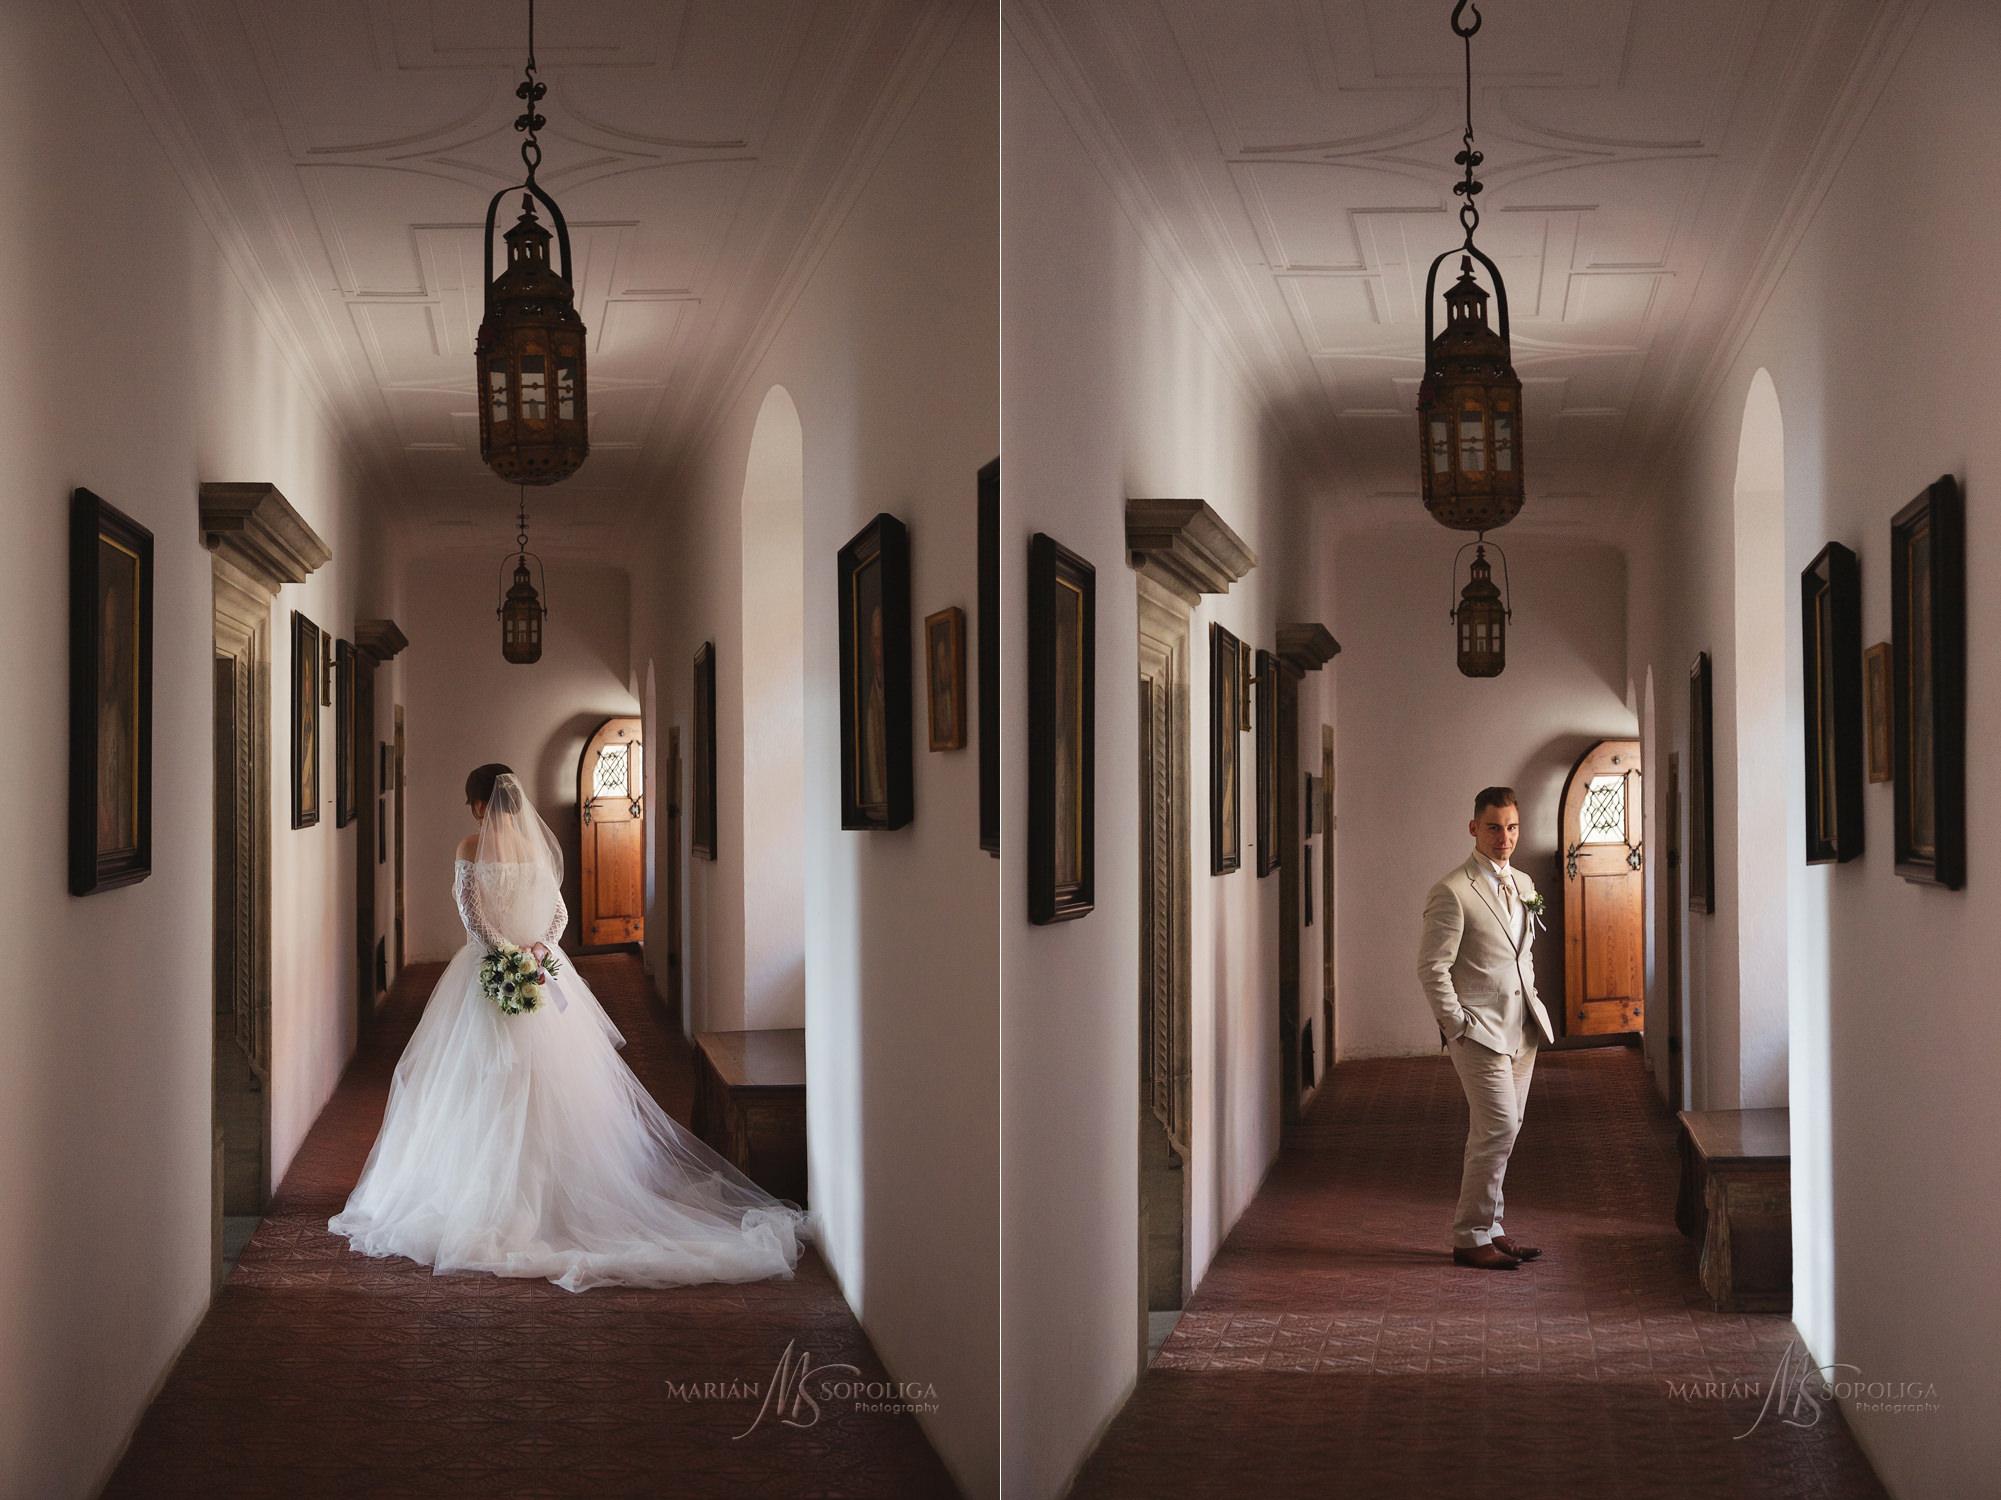 34portretni-svatebni-fotky-novomazelu-v-interieru-statniho-hradu